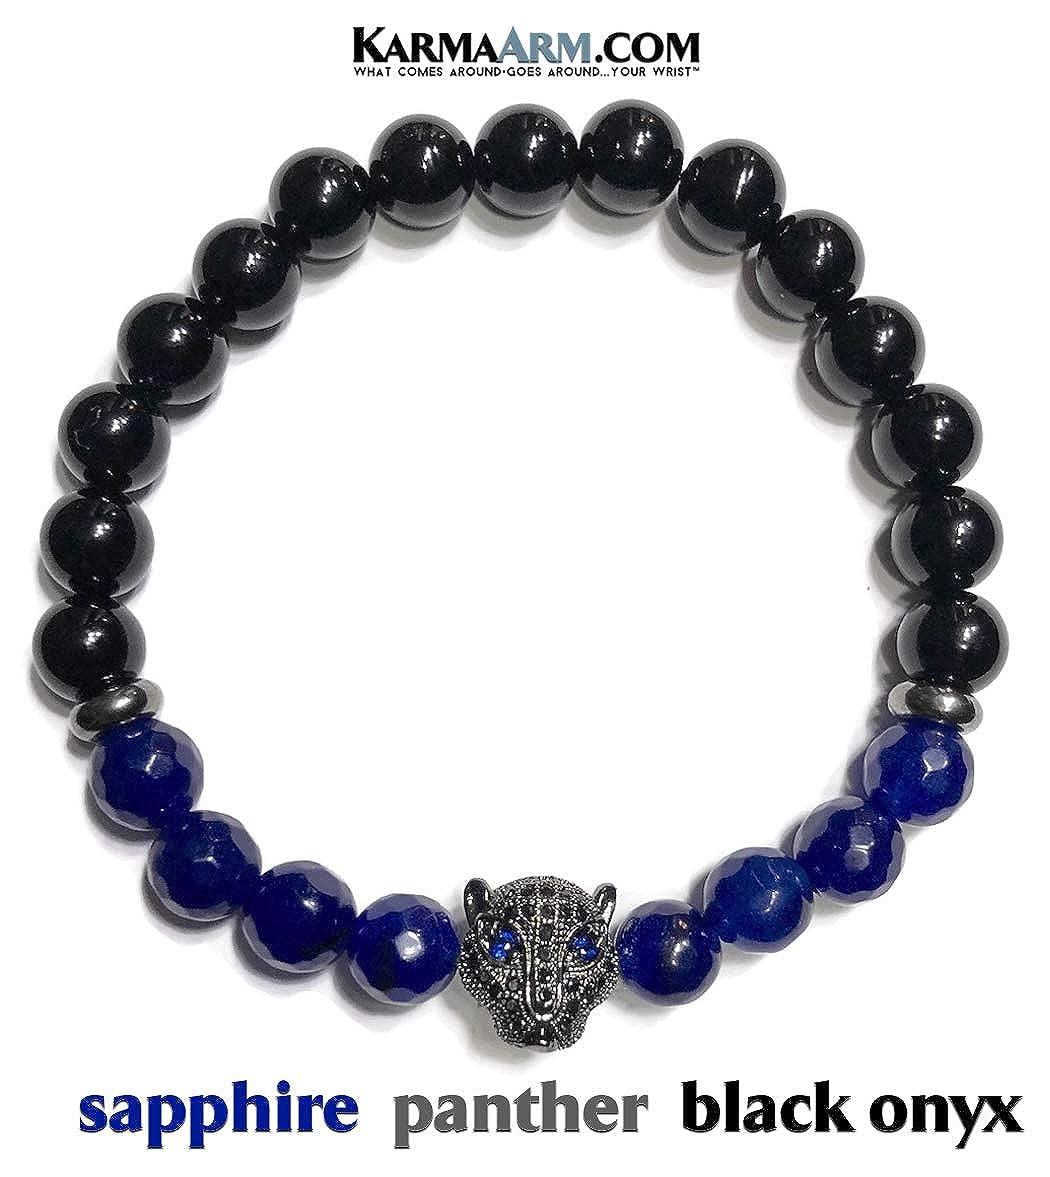 Courage Sapphire Yoga Reiki Healing Energy Boho Beaded Meditation Jewelry Black Onyx KarmaArm Black Panther Bracelet